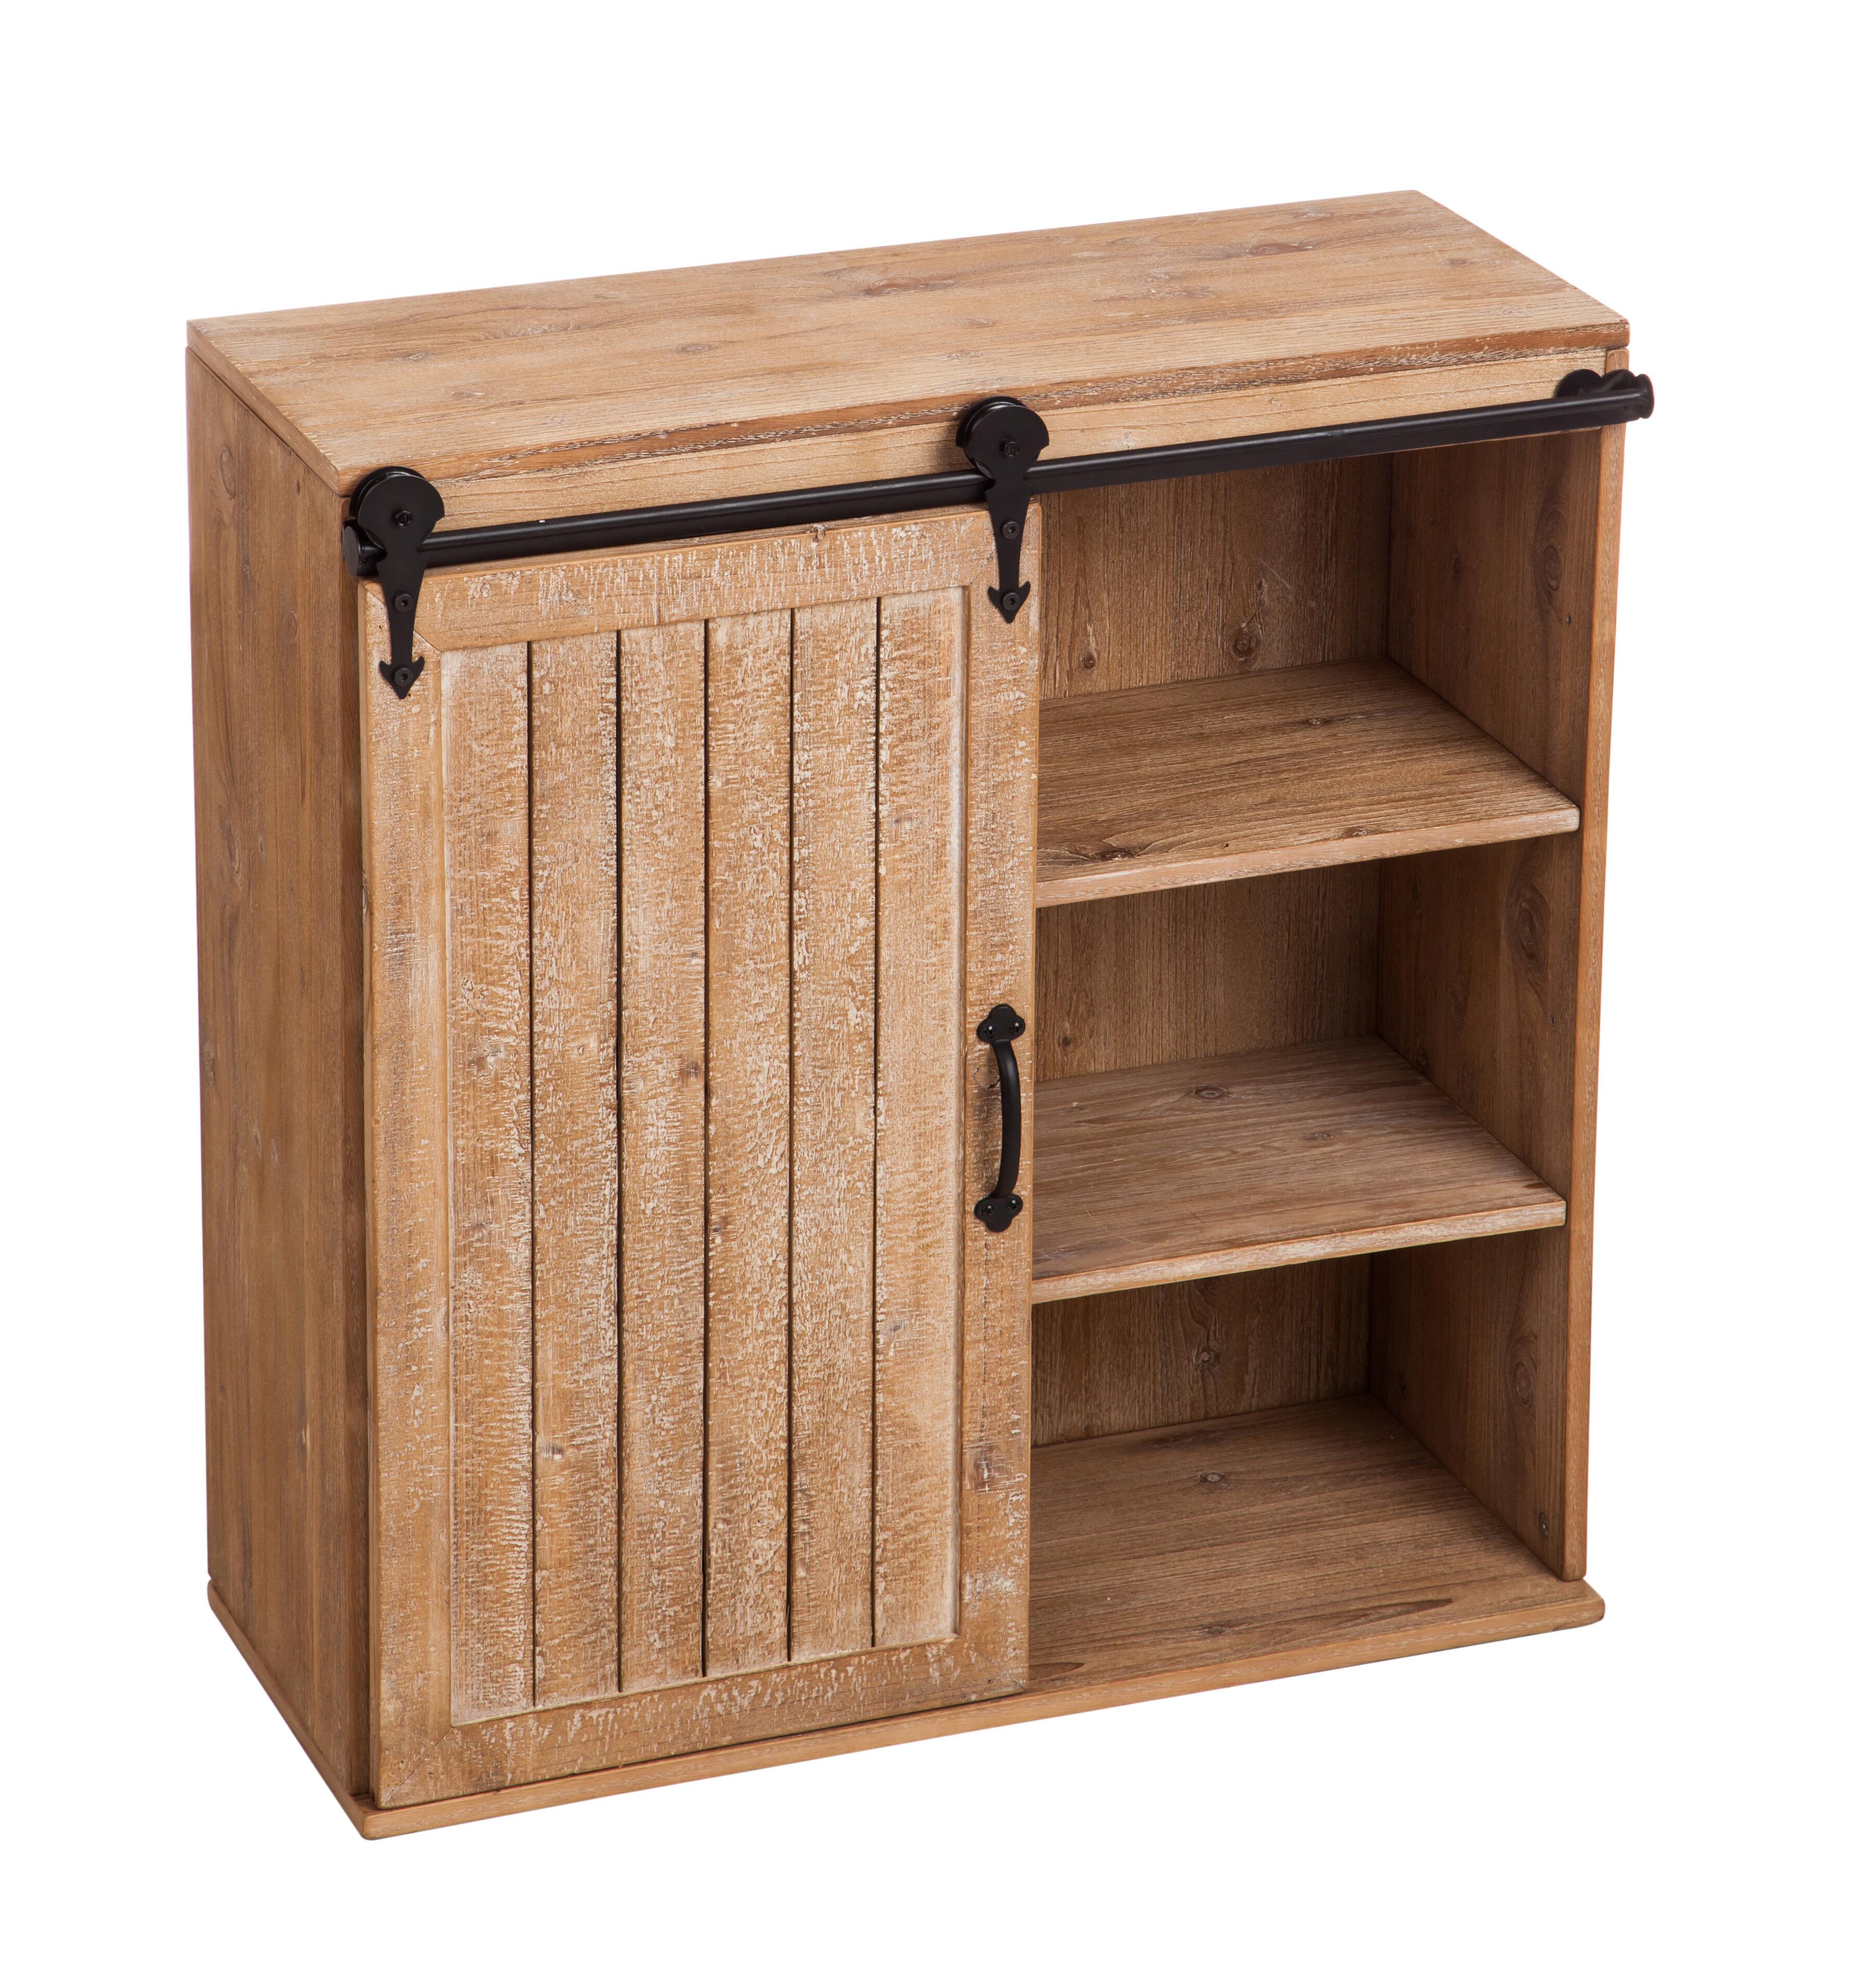 Khoa Wooden Display Hutch Wall Shelf